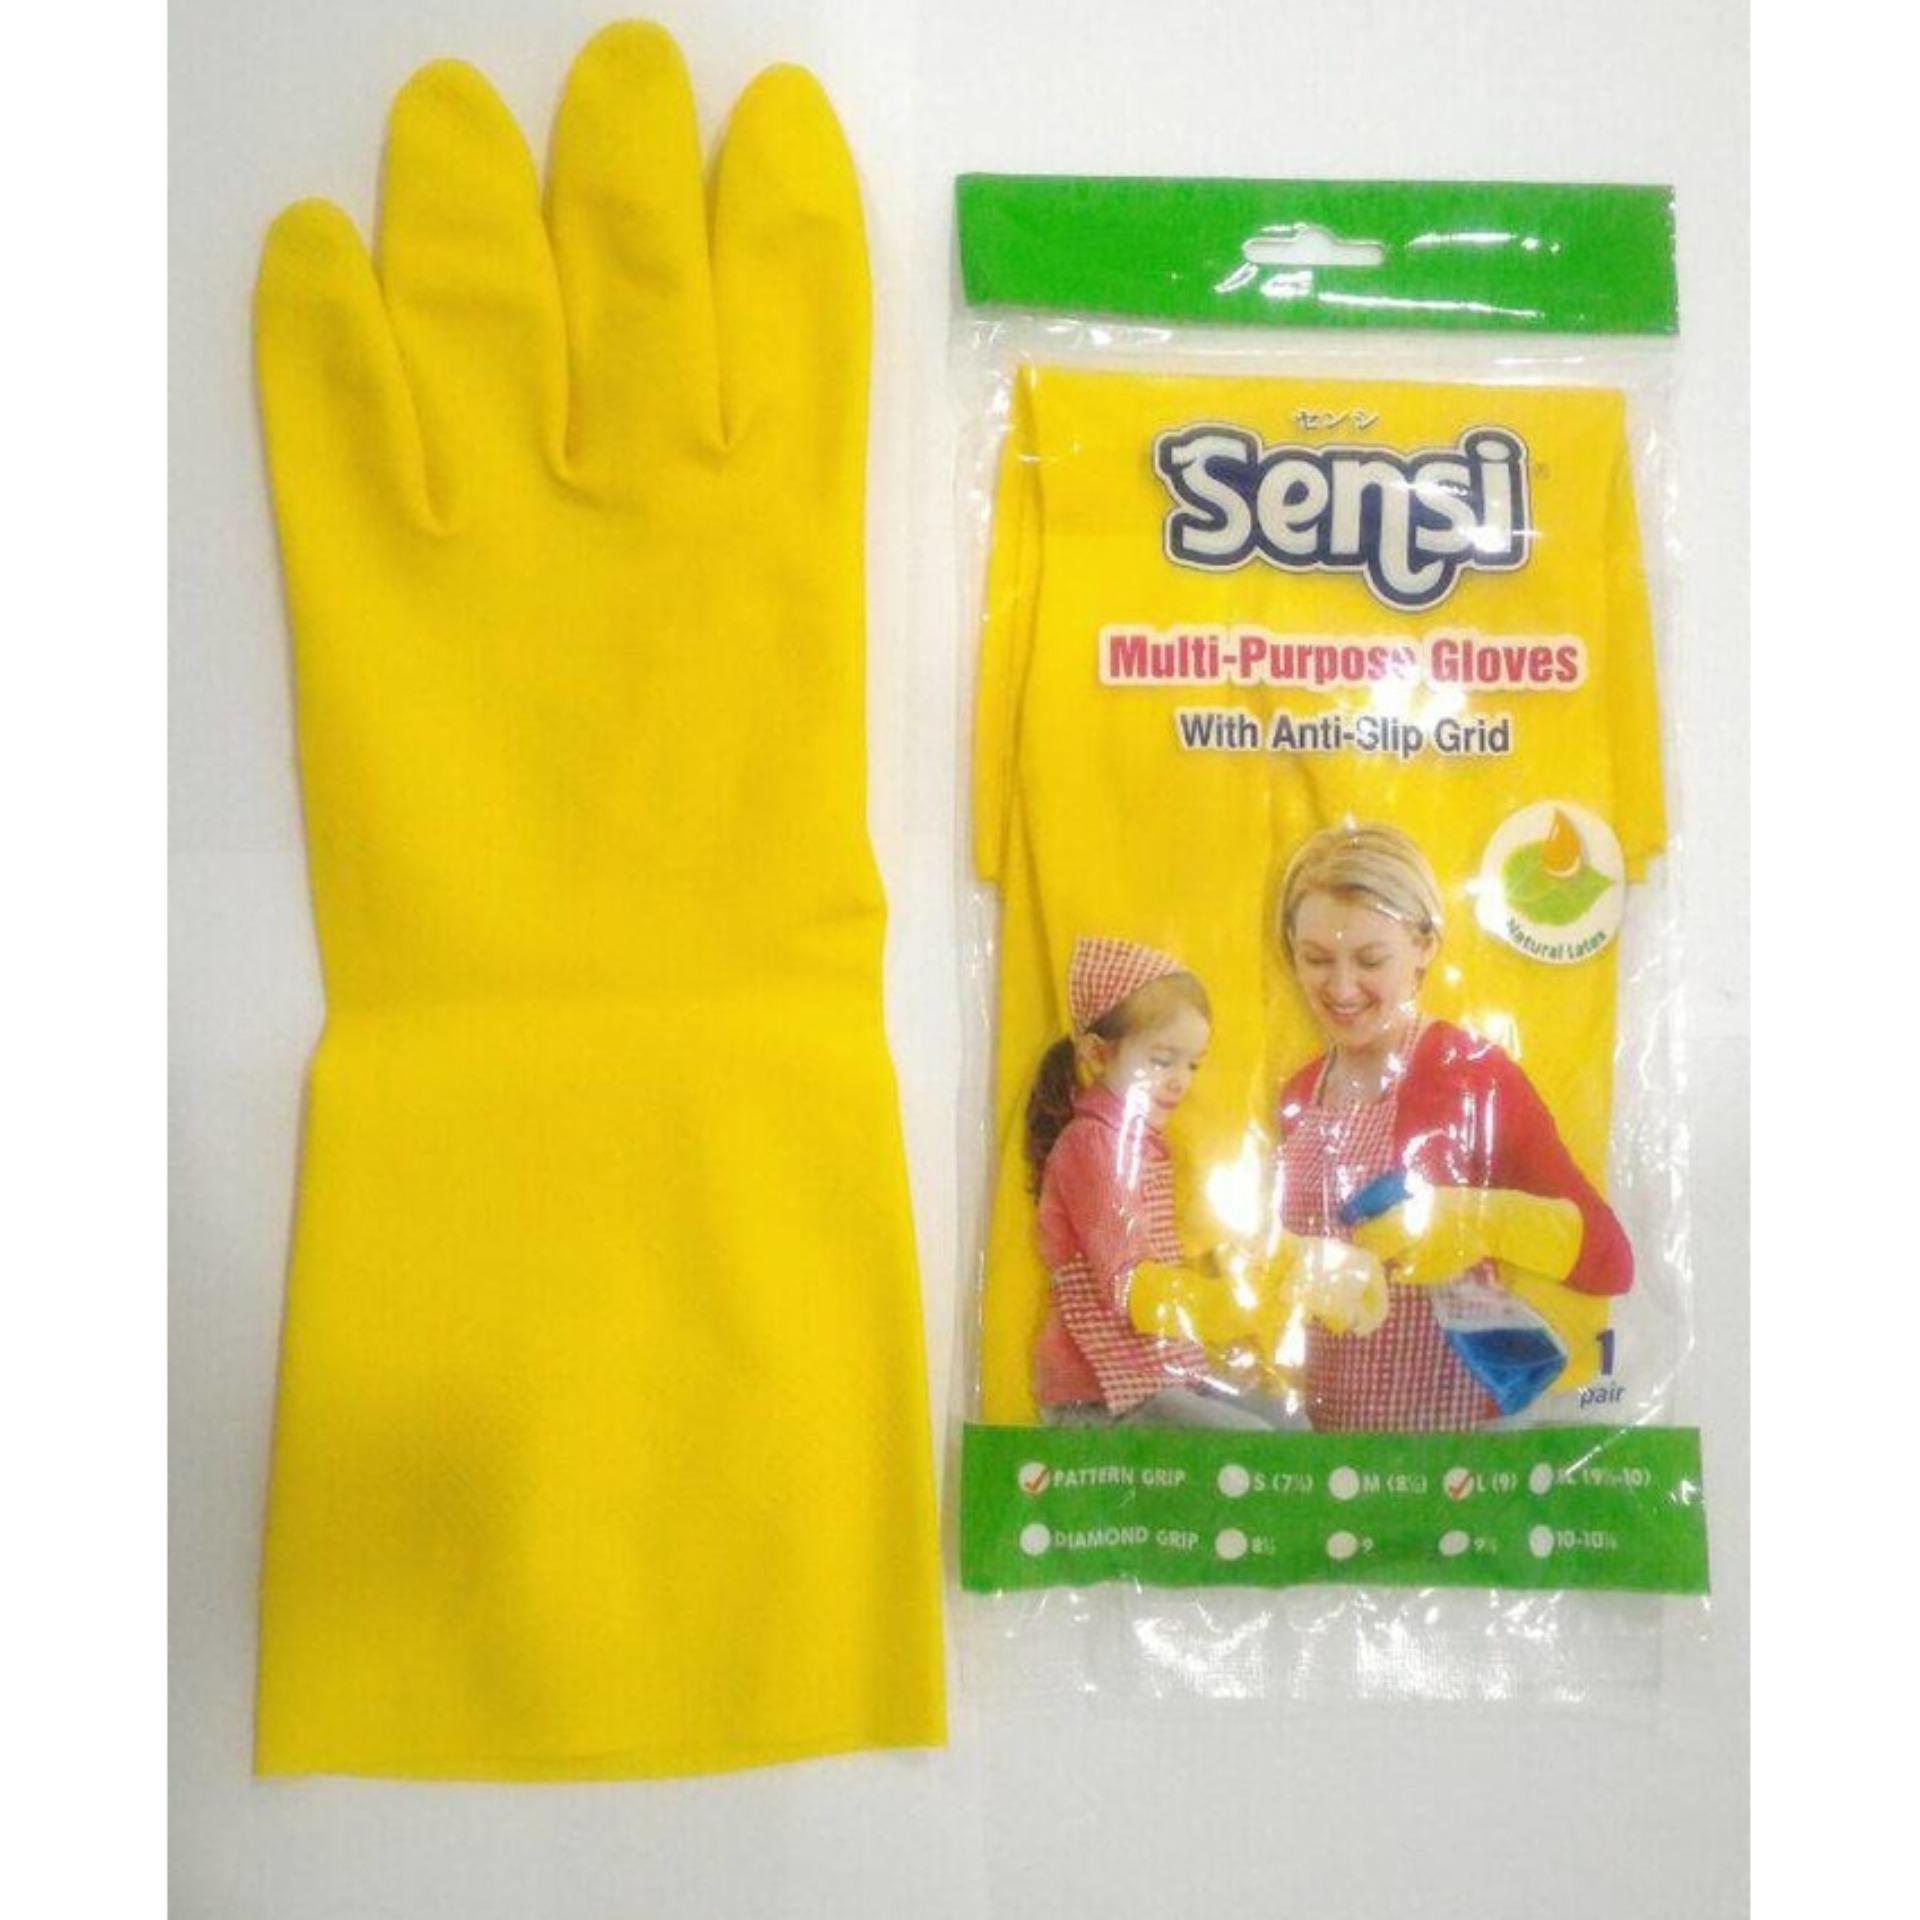 2psg - Sarung tangan karet glove kuning sensi latex cuci piring kualitas. YOUNG YOUNG Sarung